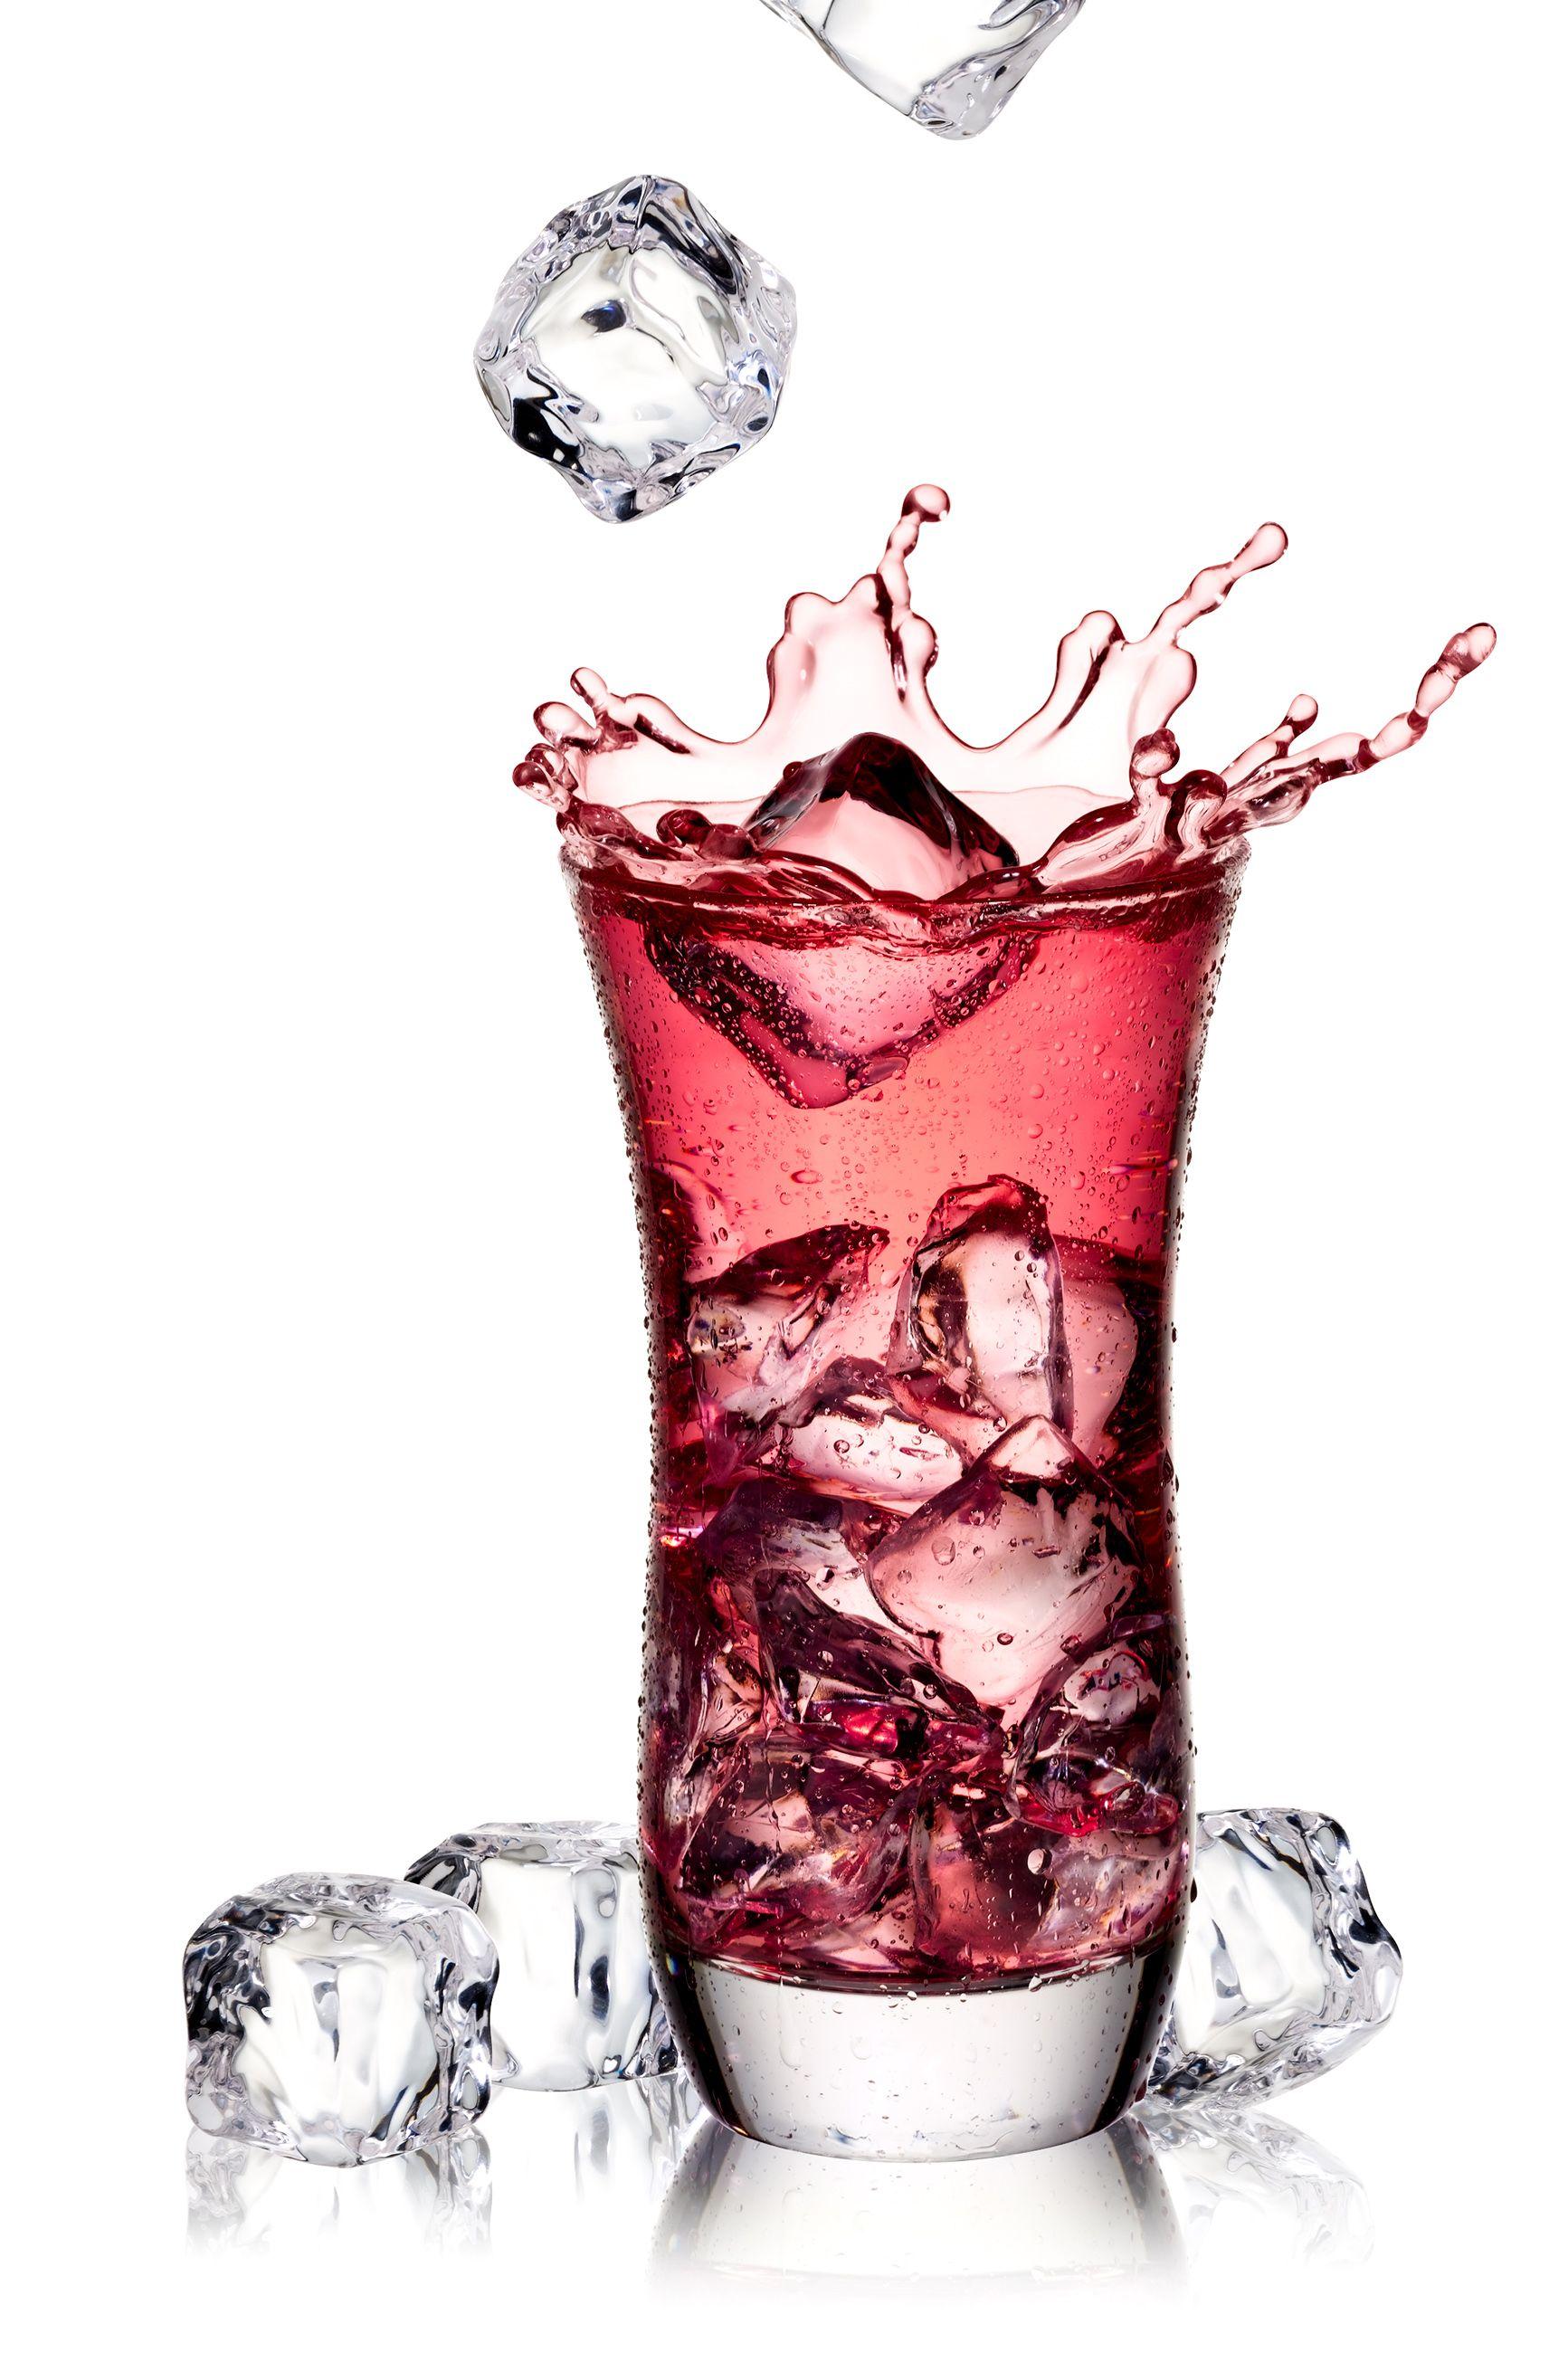 SplashAction.jpg